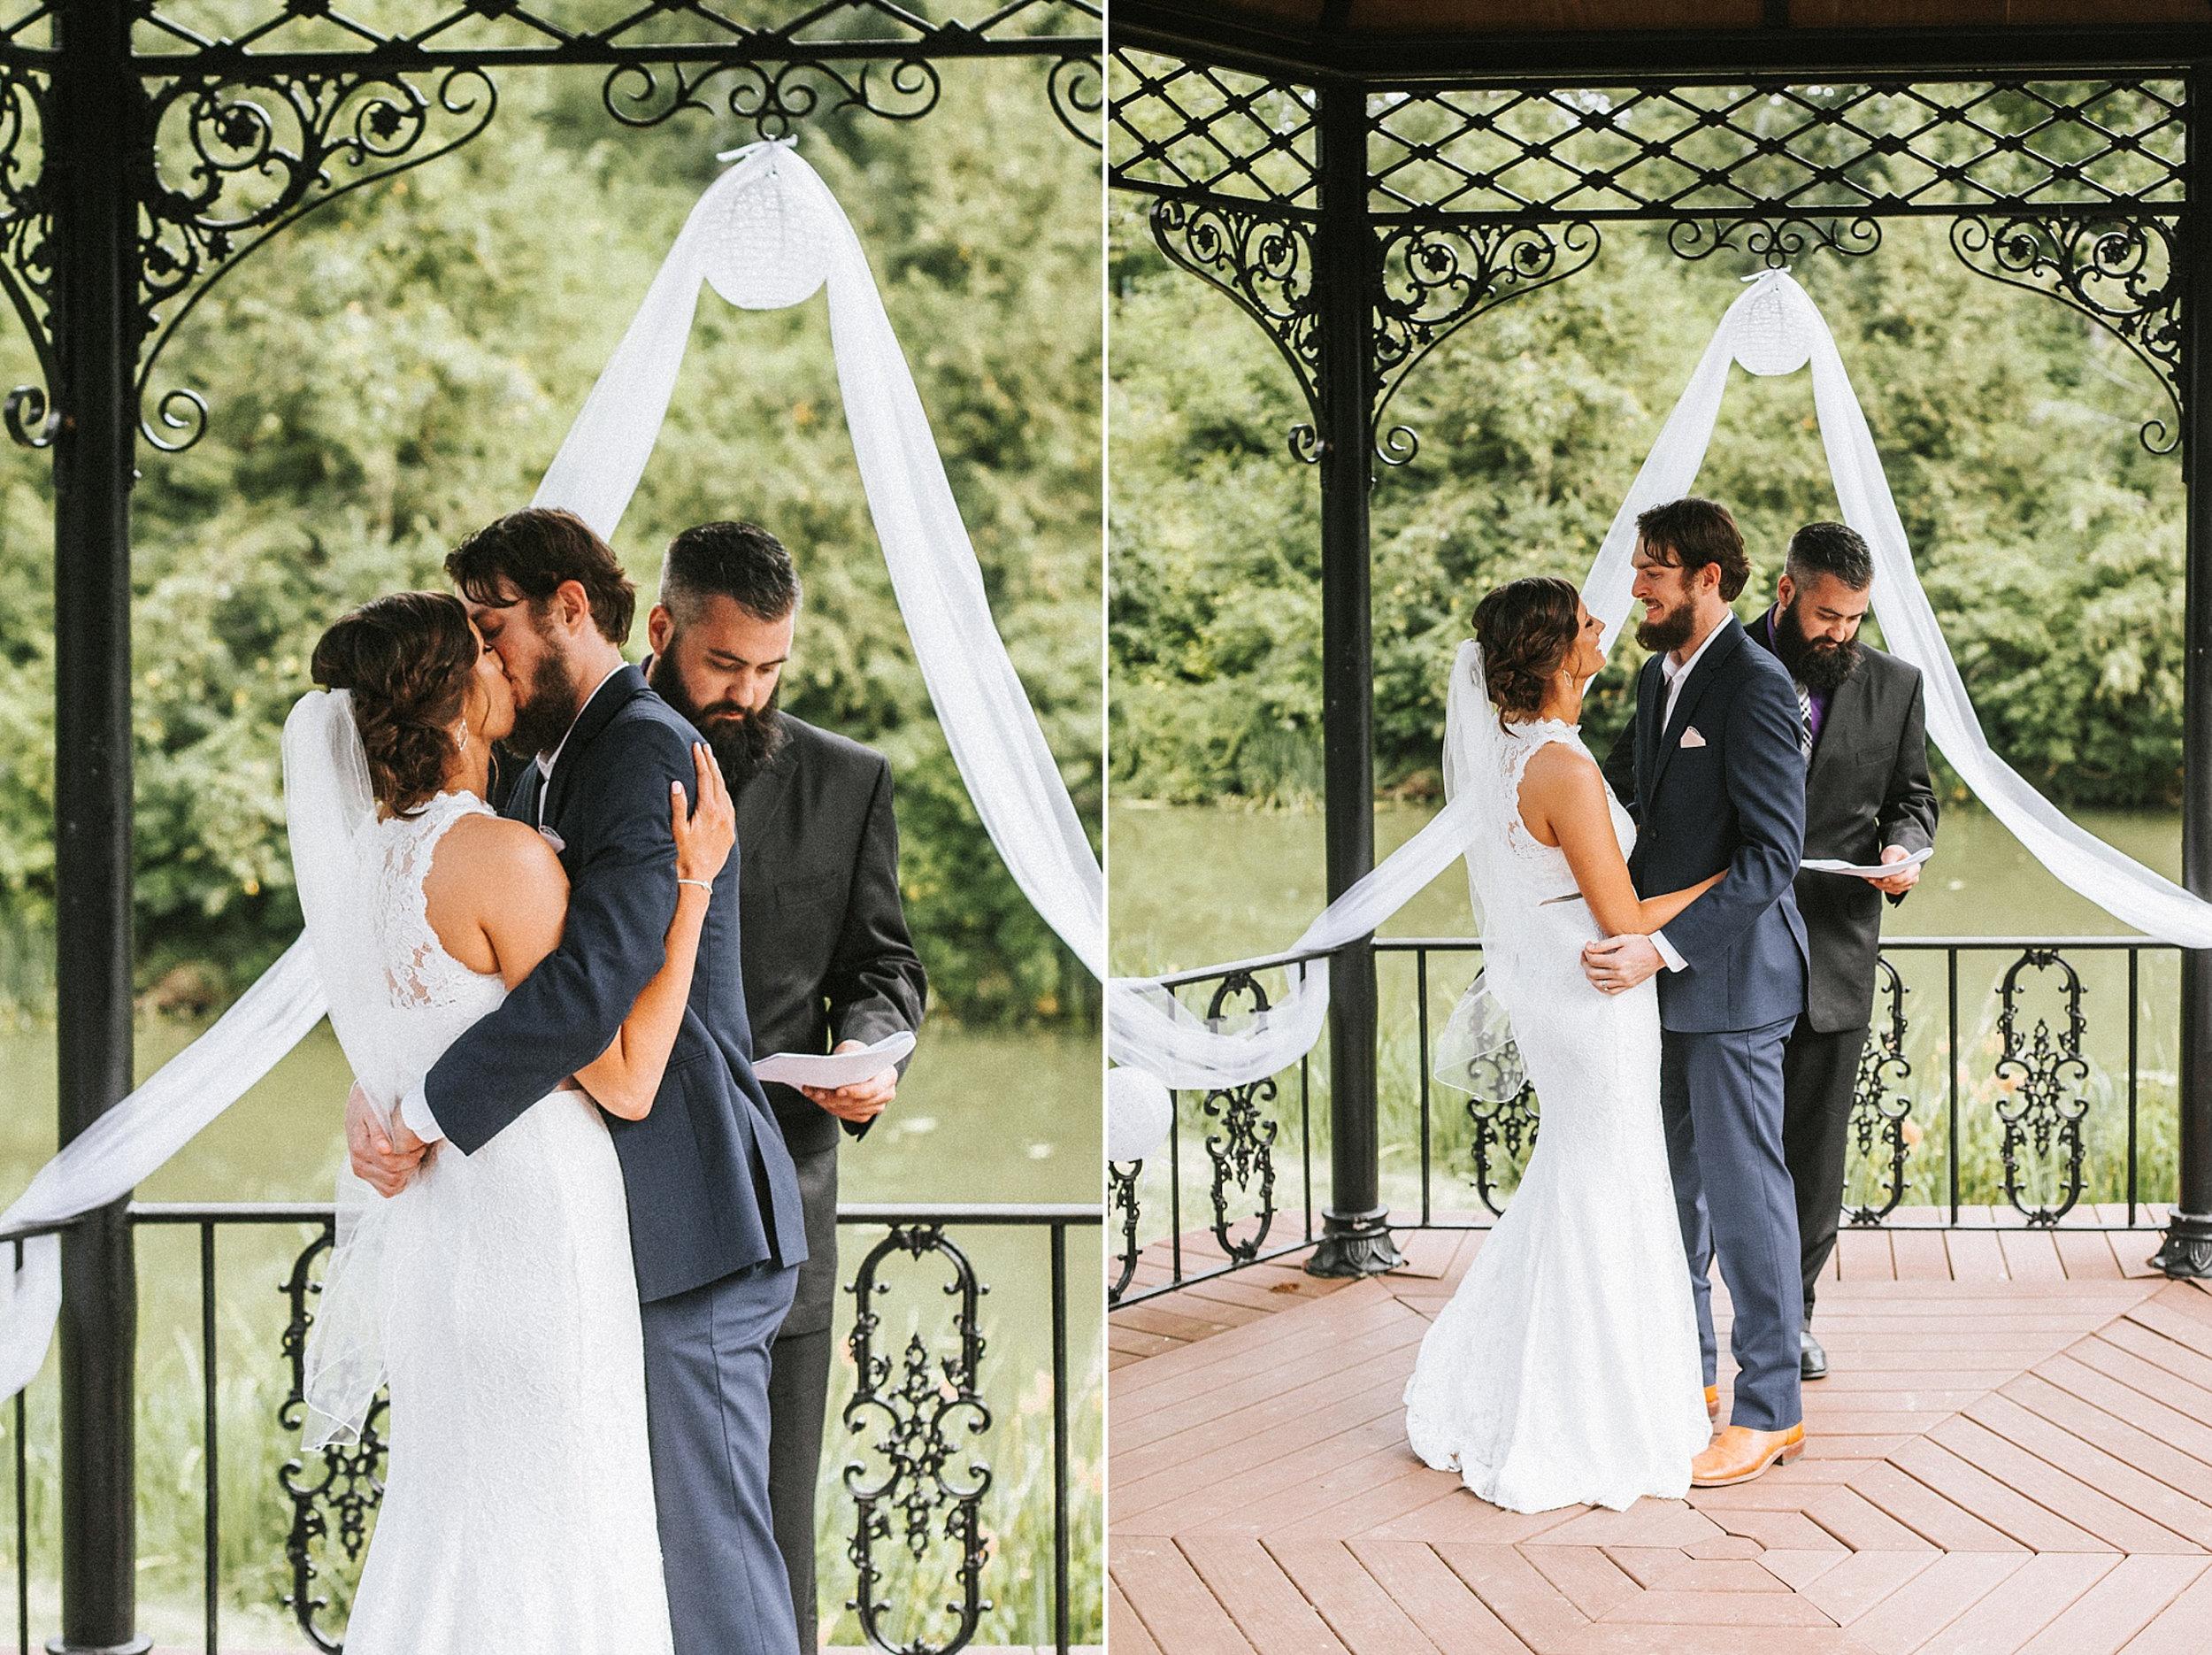 Brooke Townsend Photography - Ohio Wedding Photographer (66 of 78).jpg